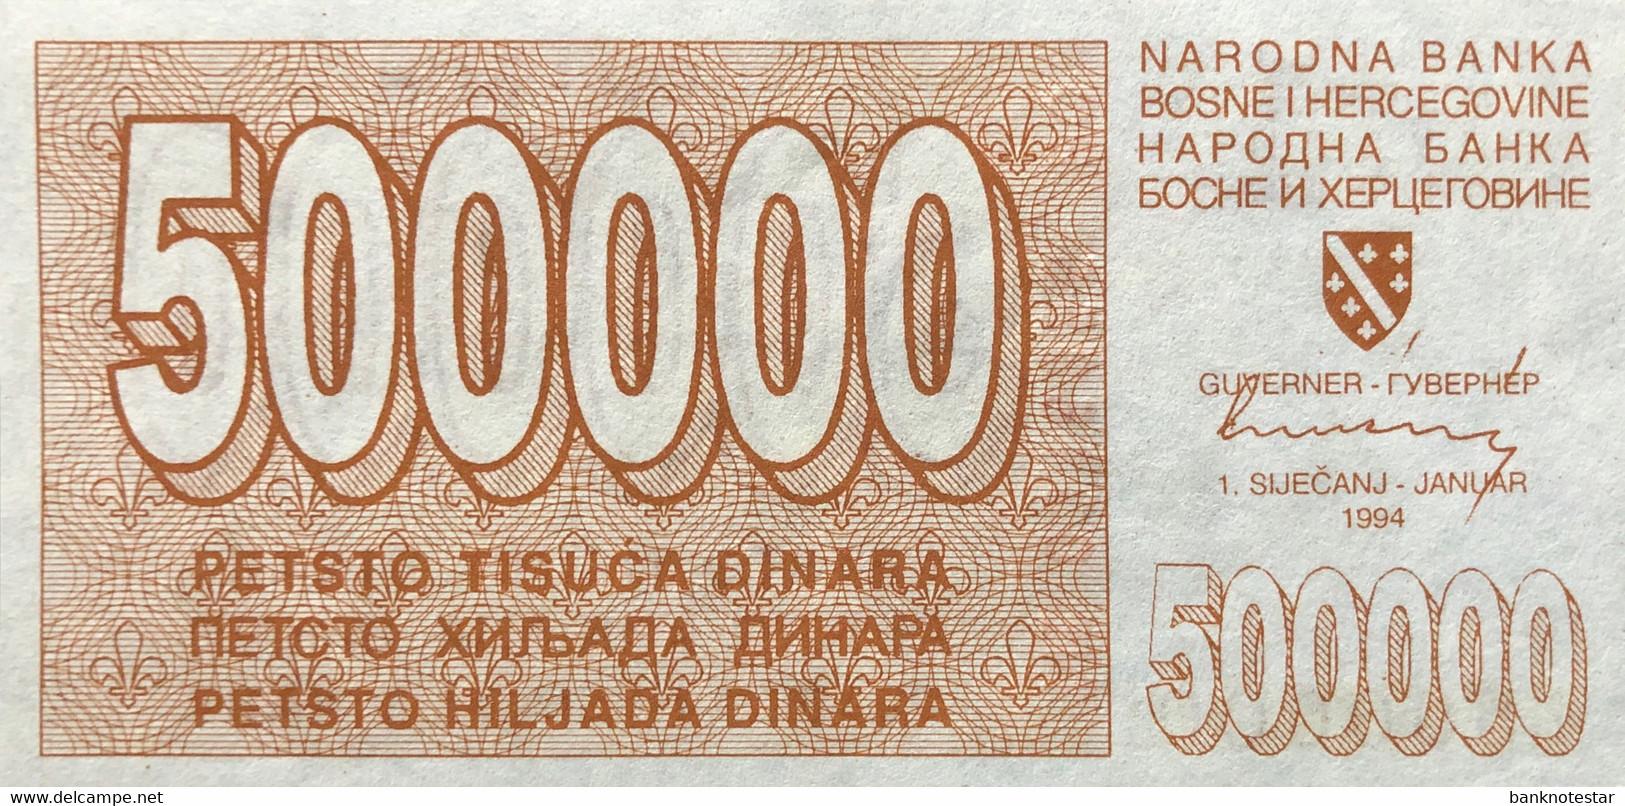 Bosnia 500.000 Dinara, P-32 (1.1.1994) - UNC - Very Rare In This Condition - Bosnia And Herzegovina